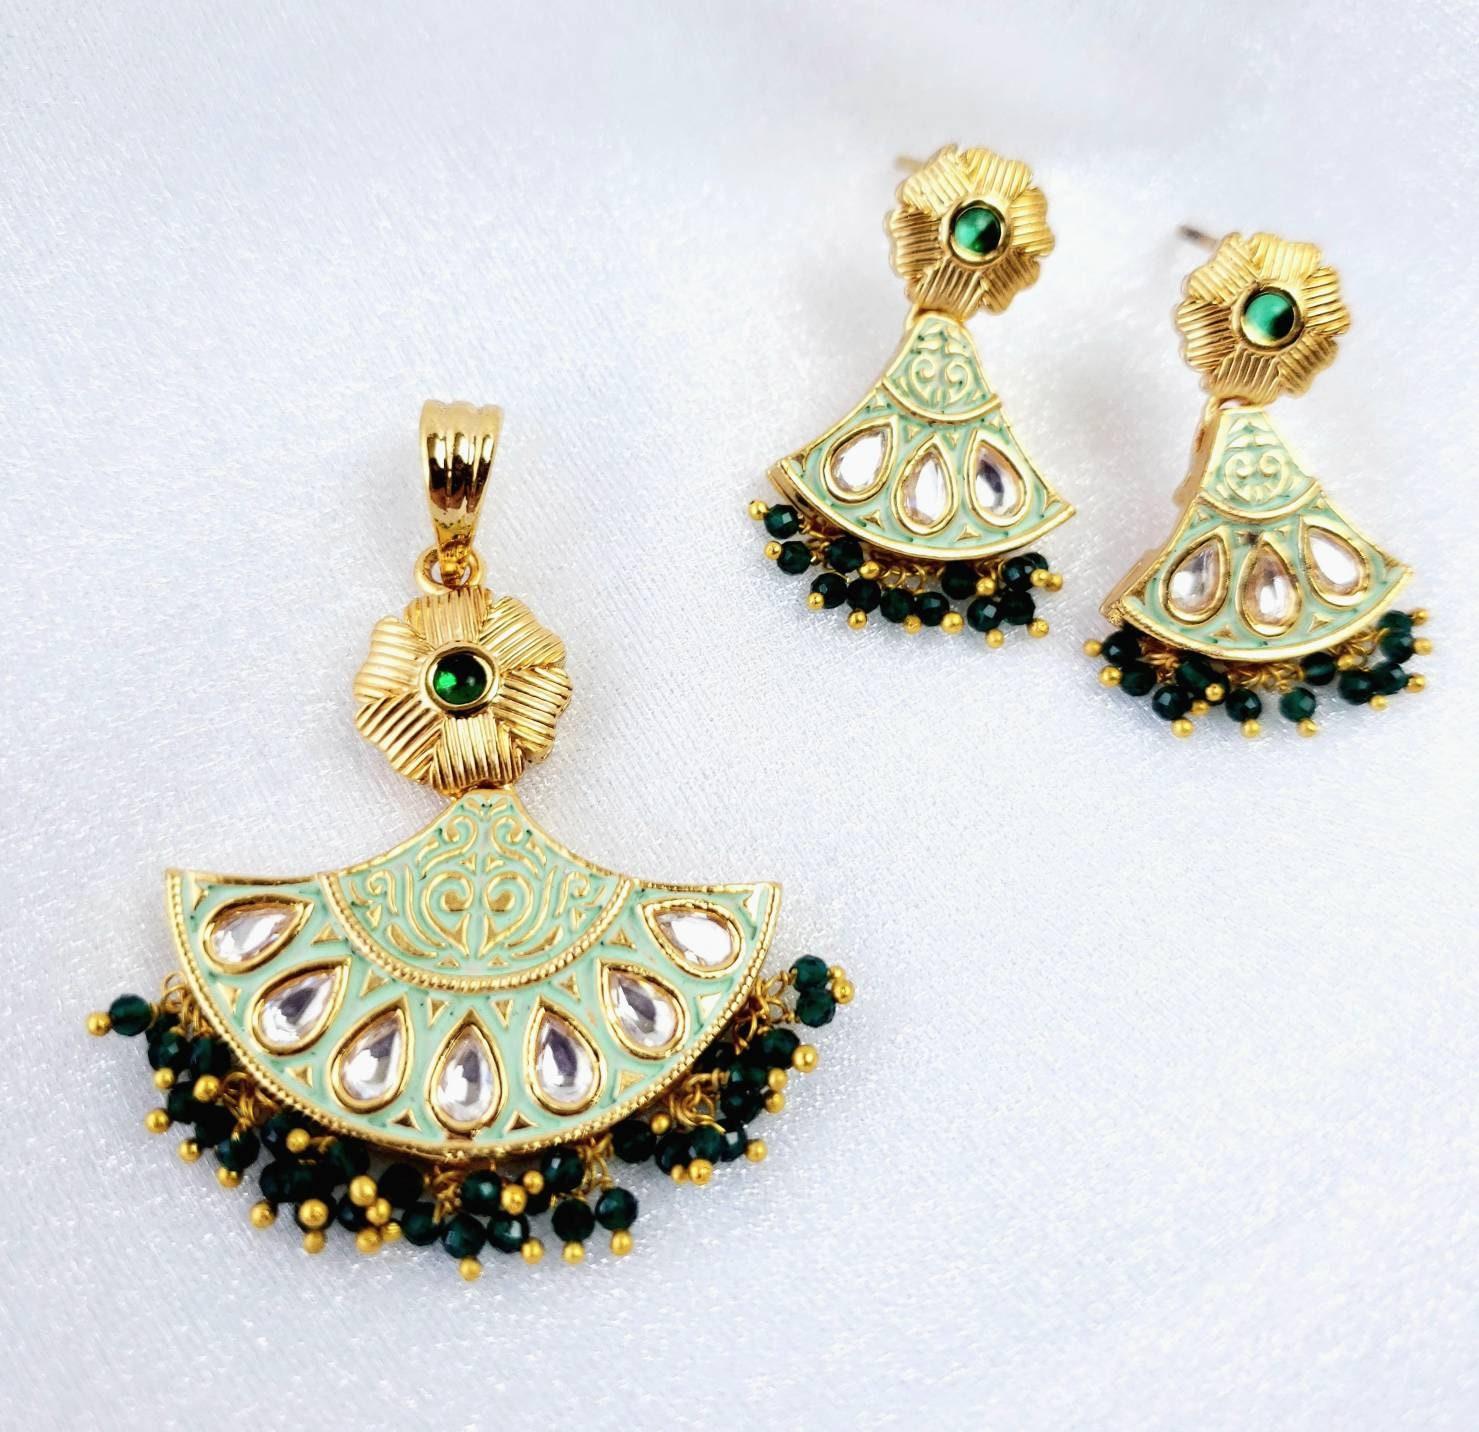 polki jewelry Indian jewelry Small goldtone kundan pendant set teardrop pendant and earrings with faux amethyst Indian pendant set